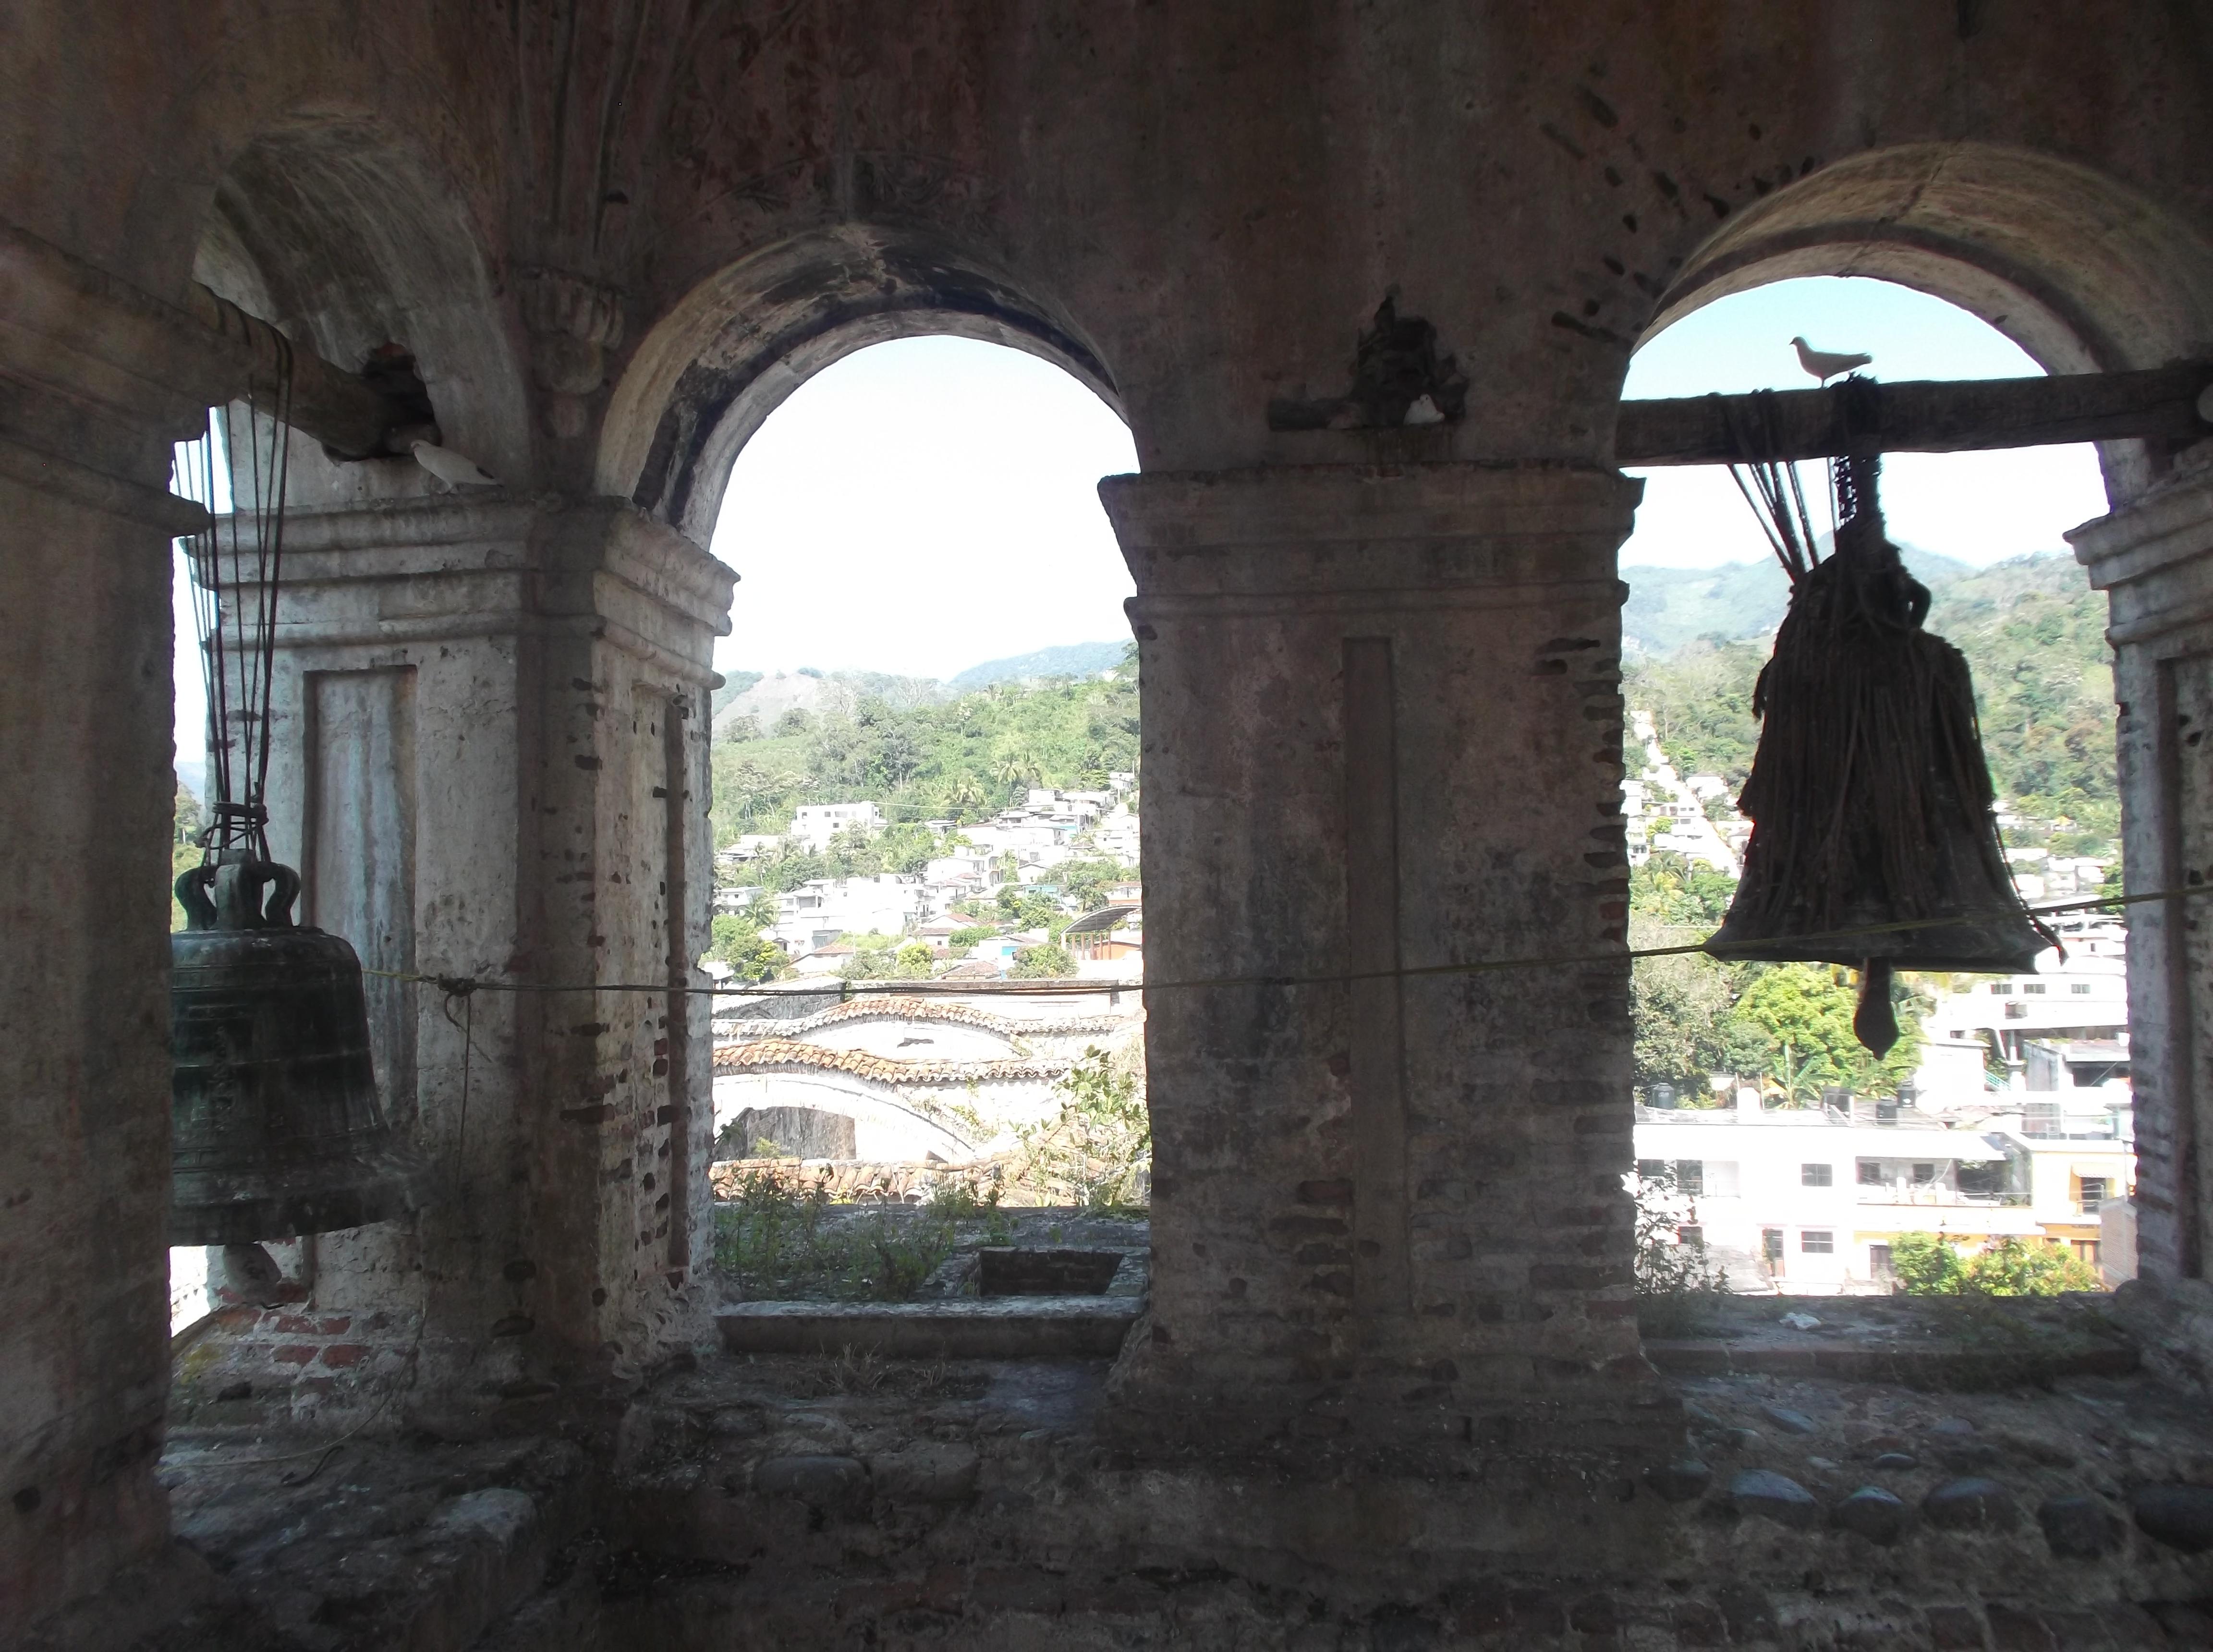 Convento de Santo Domingo por dentro